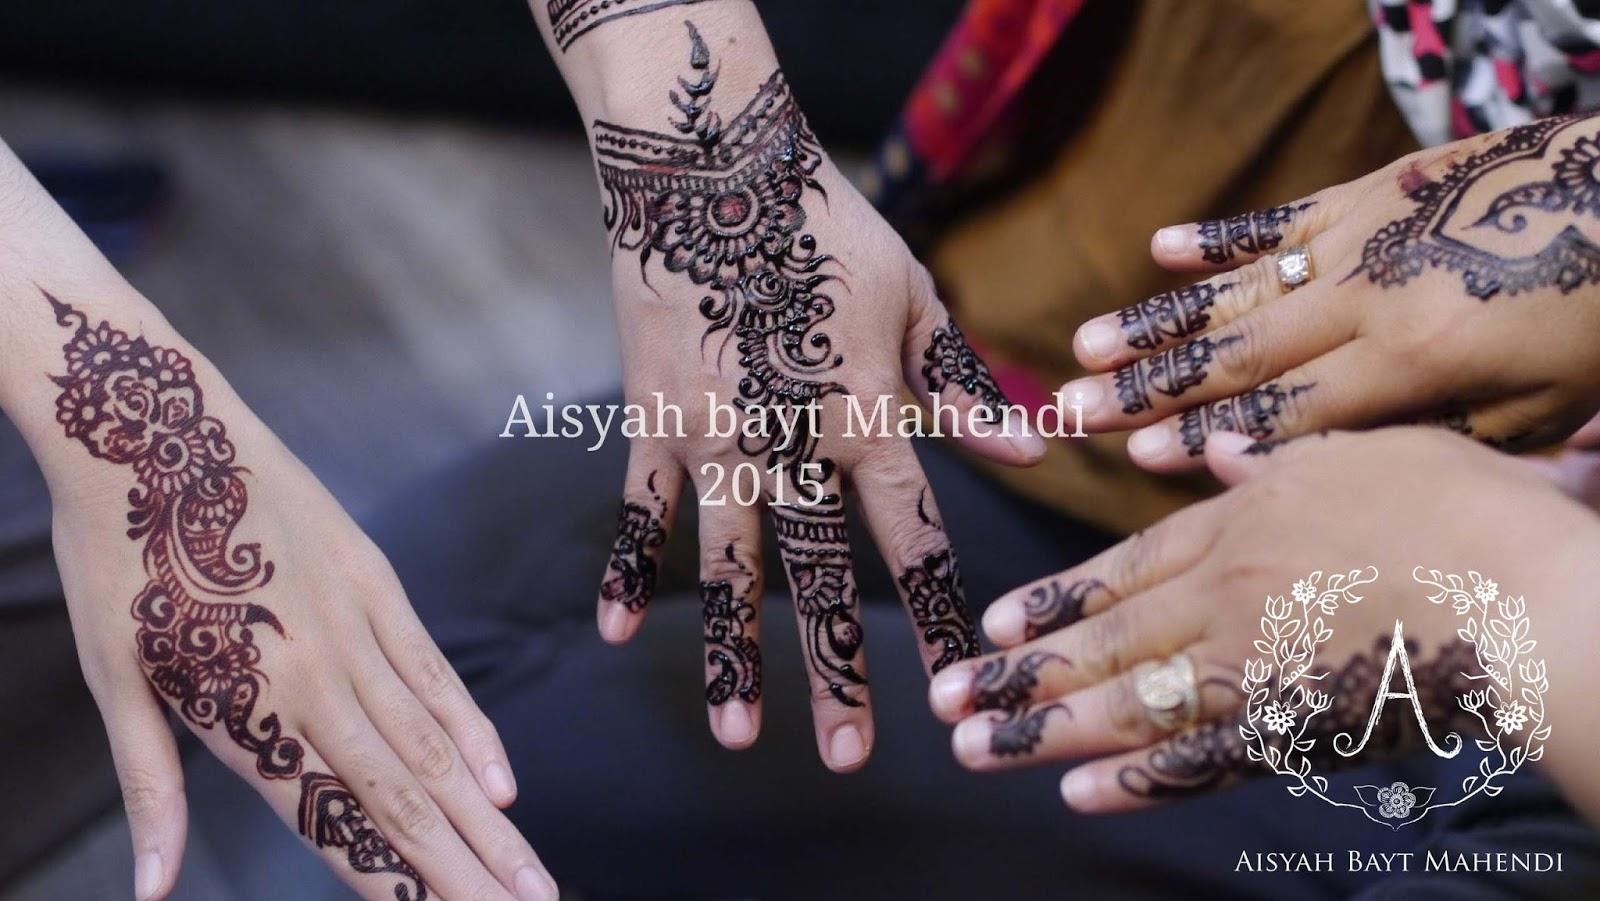 Aisyah Bayt Mahendi Henna Art Sidoarjo